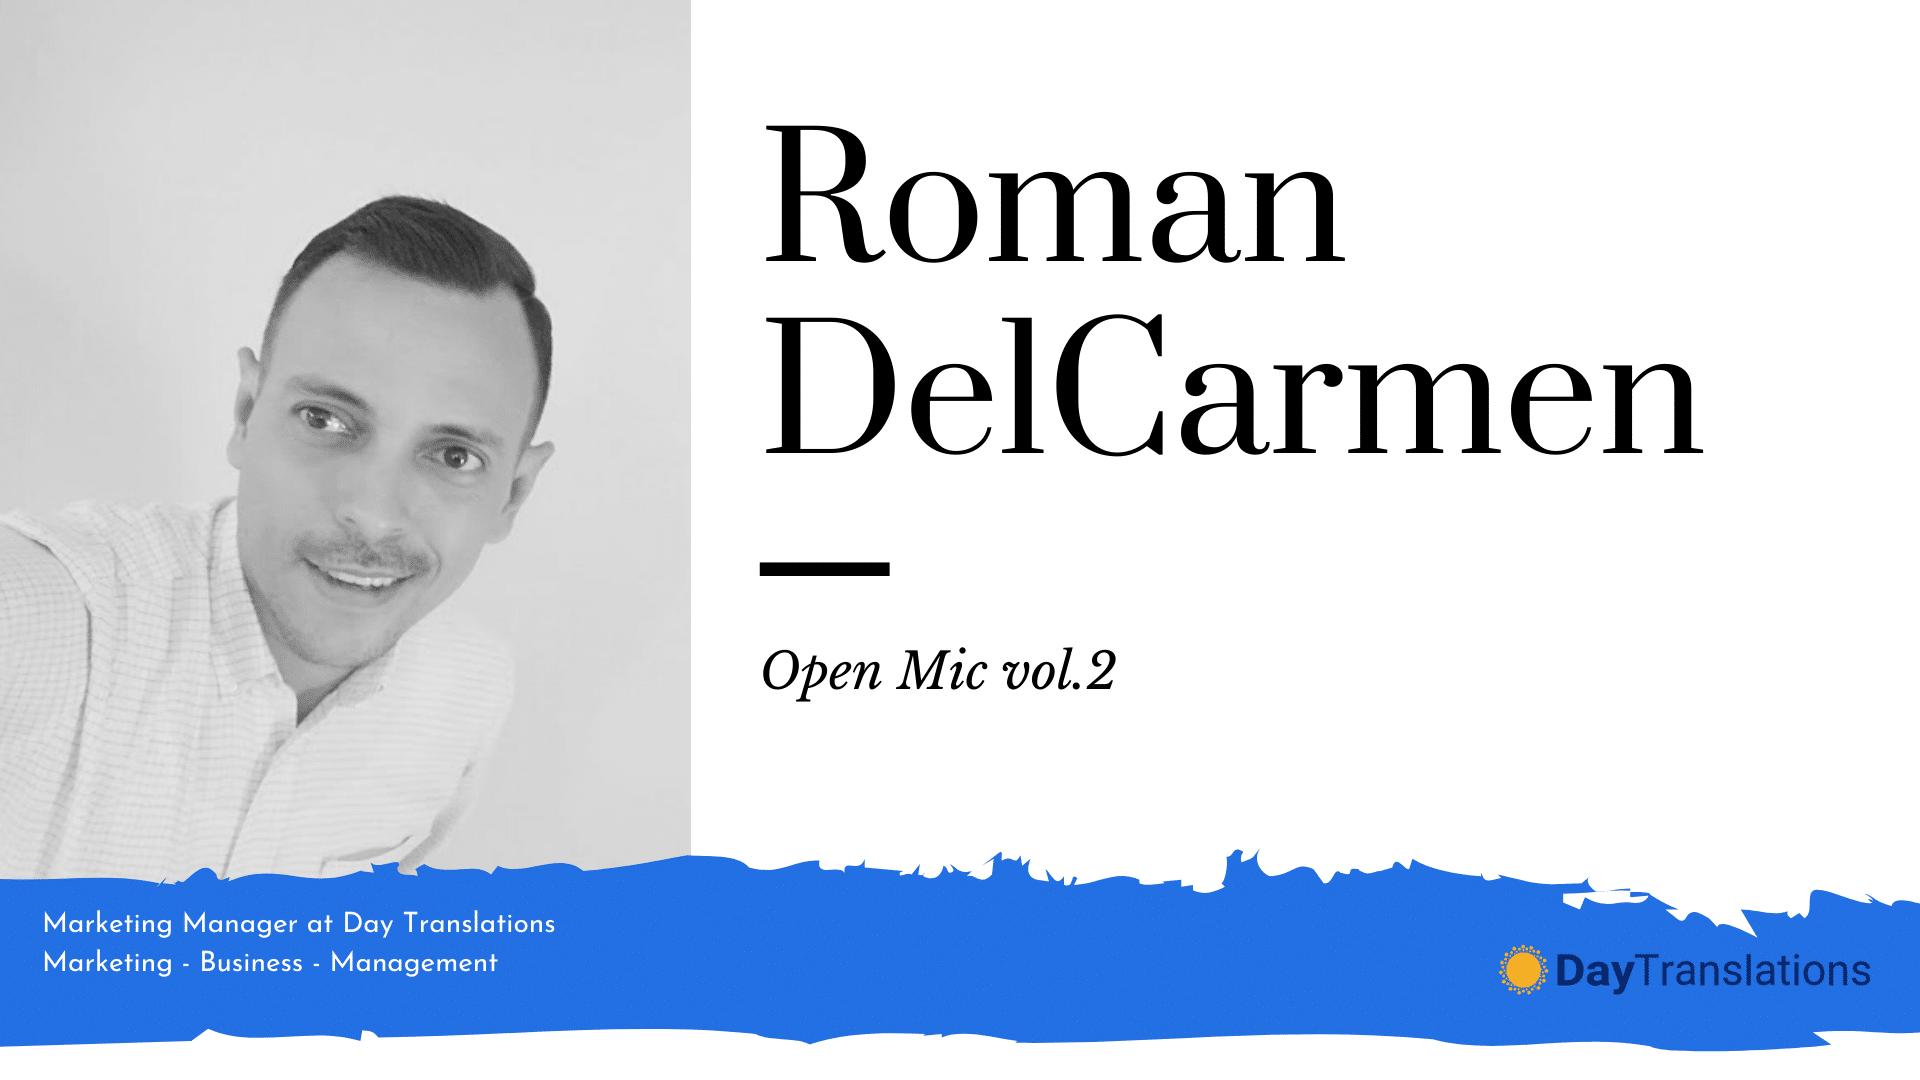 Open Mic vol. 2 – Interviewing Mr Roman Delcarmen